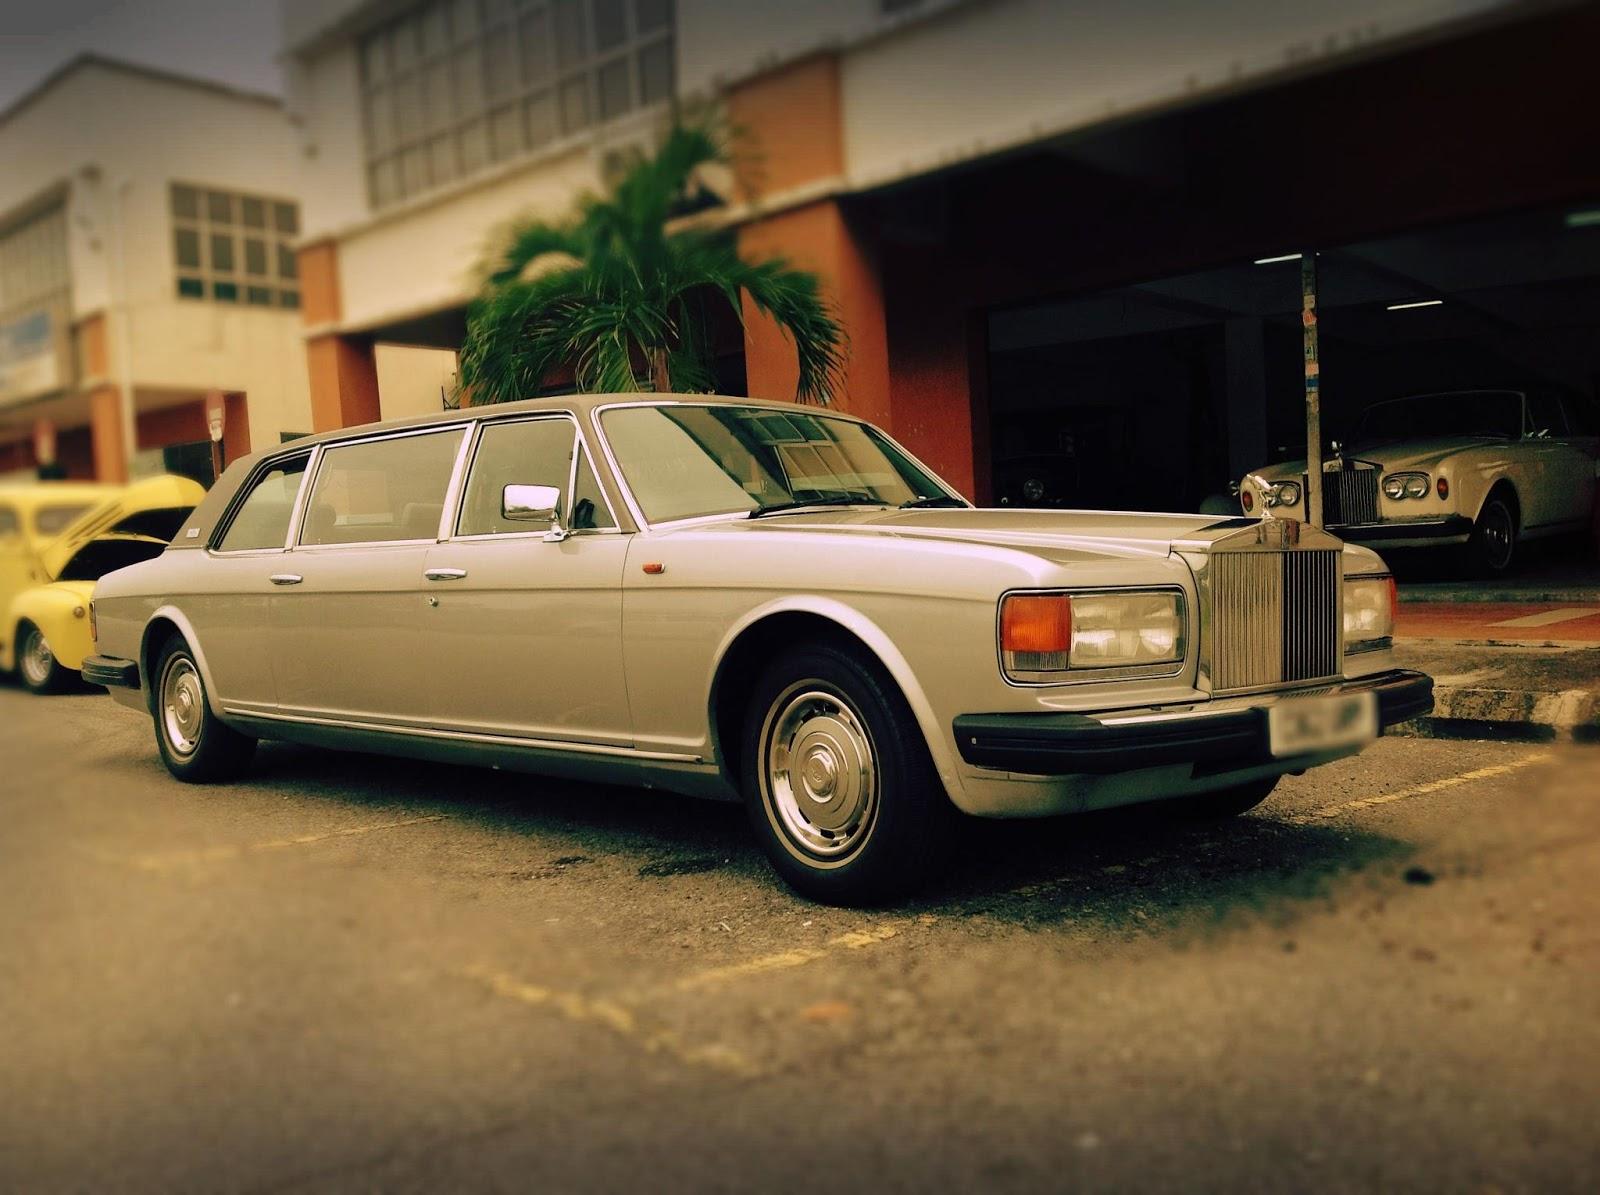 redorca malaysia wedding and event car rental rolls royce limousine rental. Black Bedroom Furniture Sets. Home Design Ideas